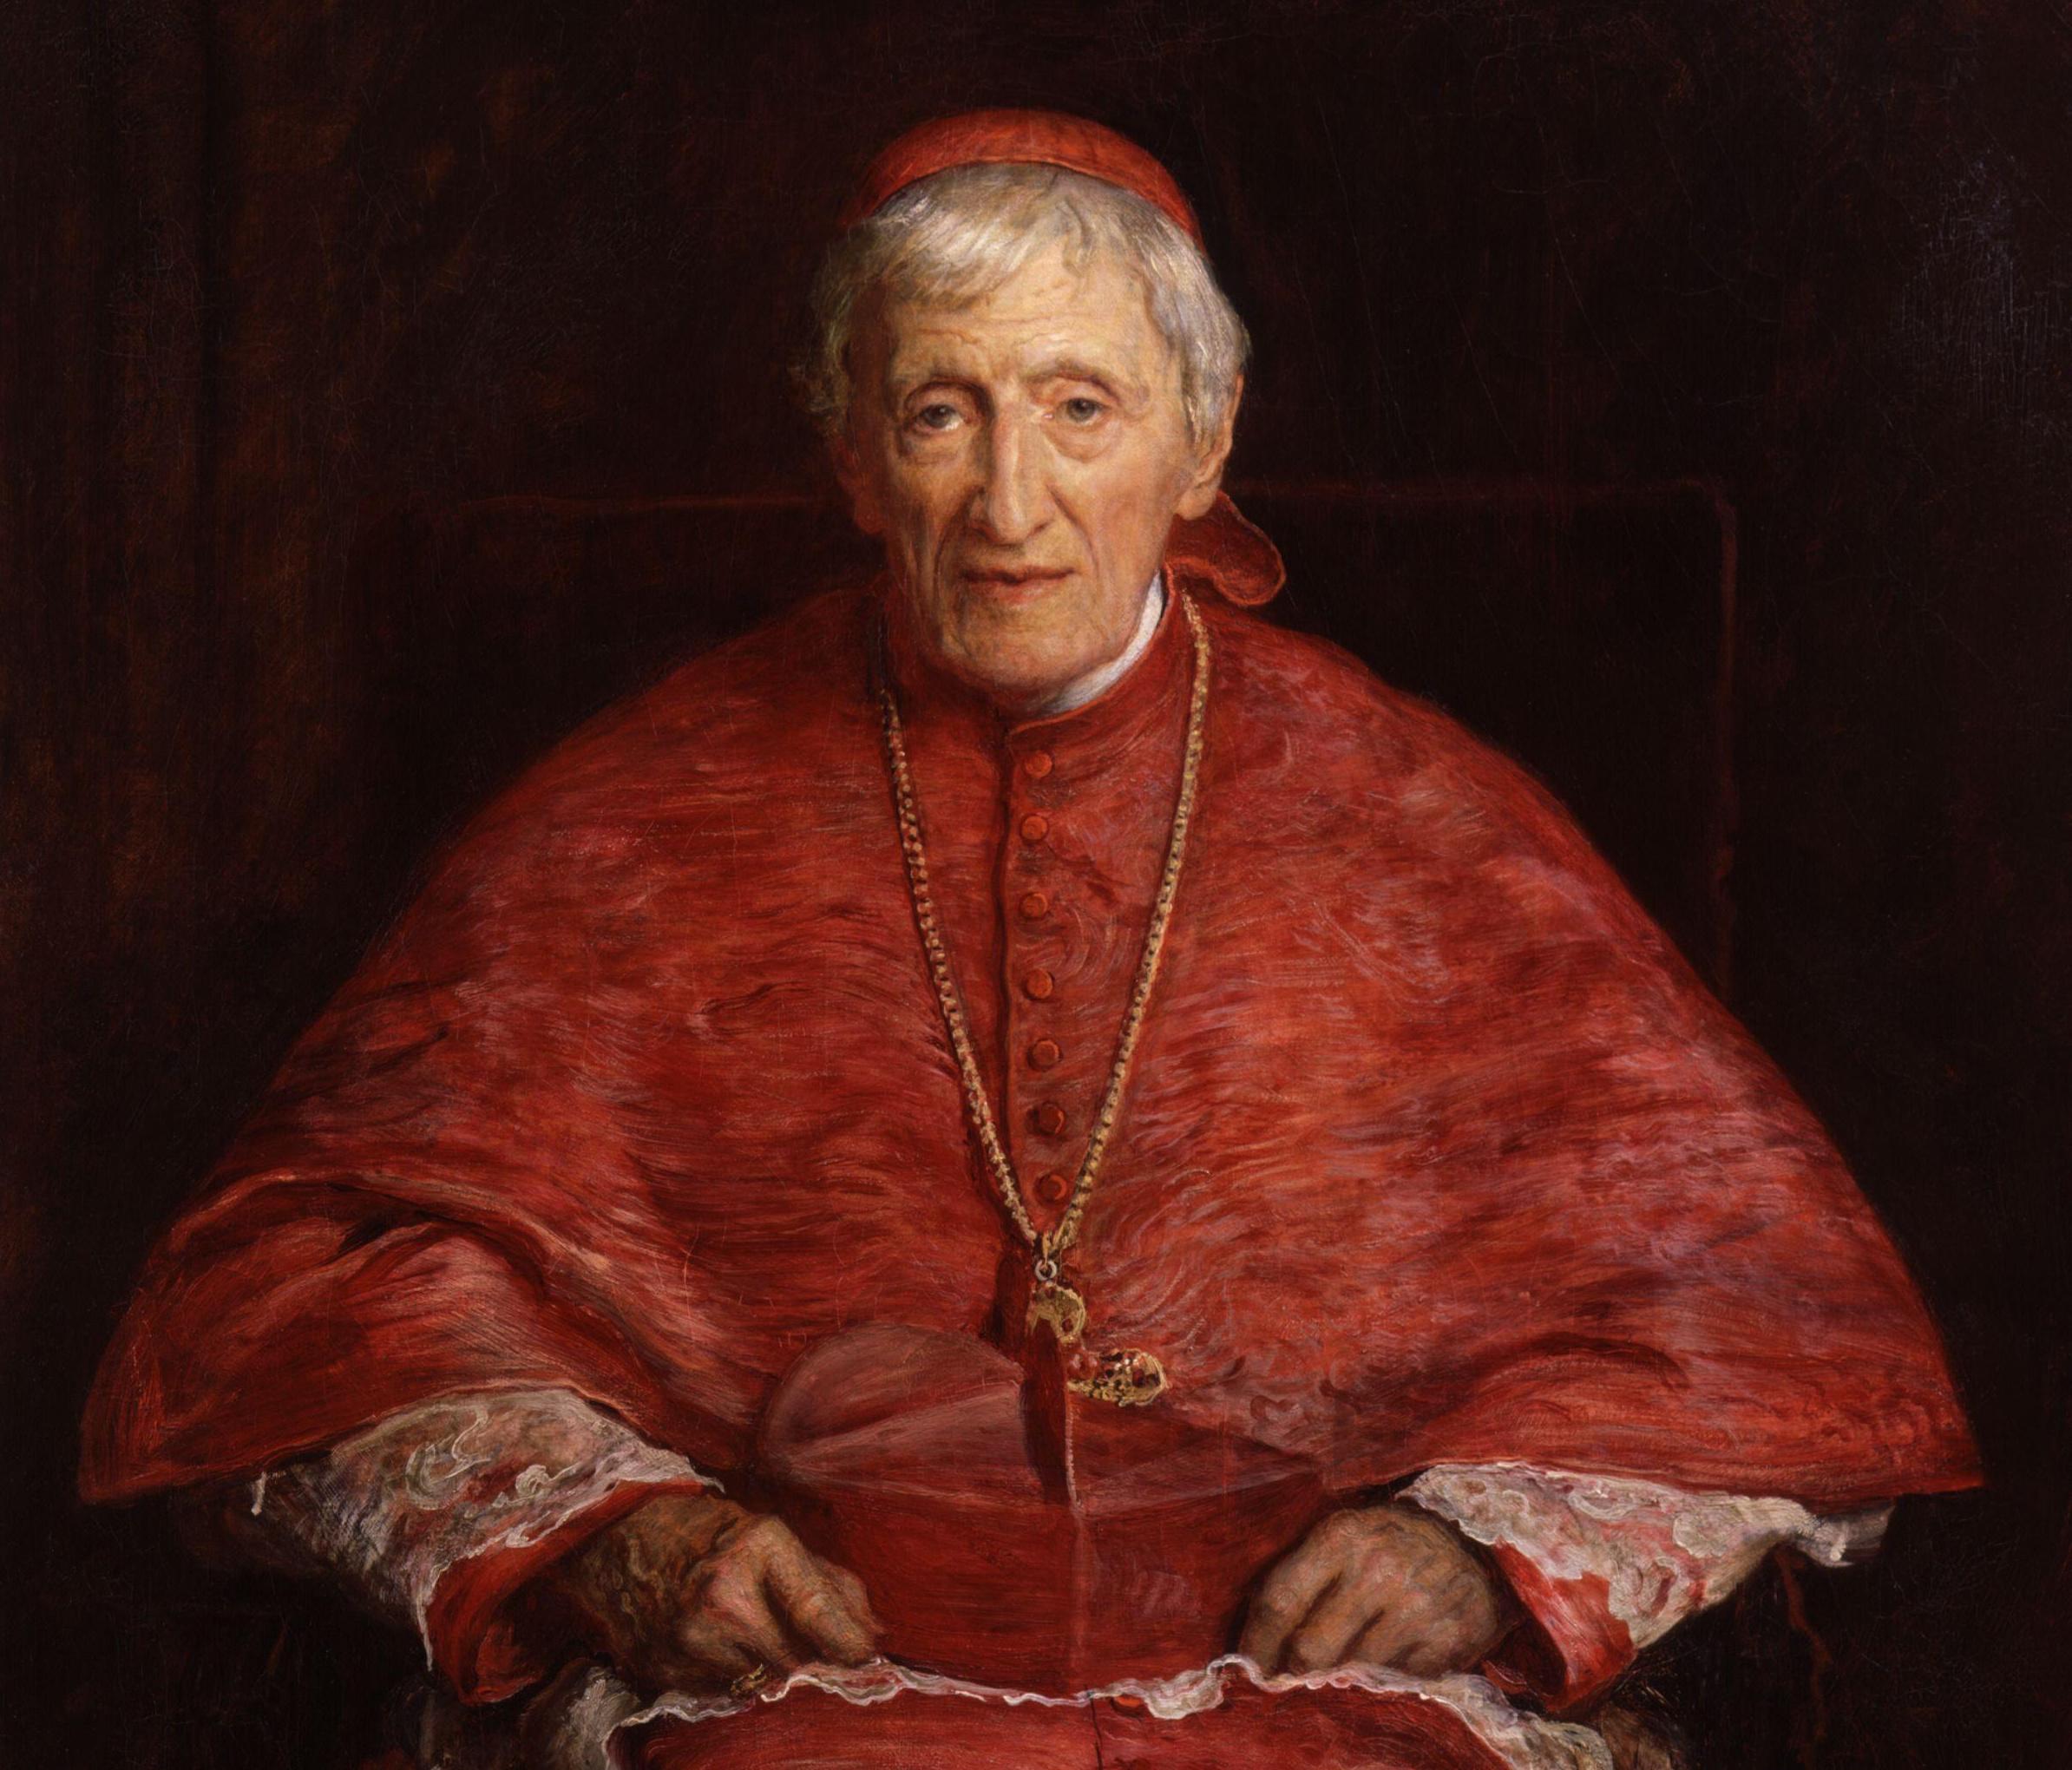 Retrato de John Henry Newman, de John Everett Millais